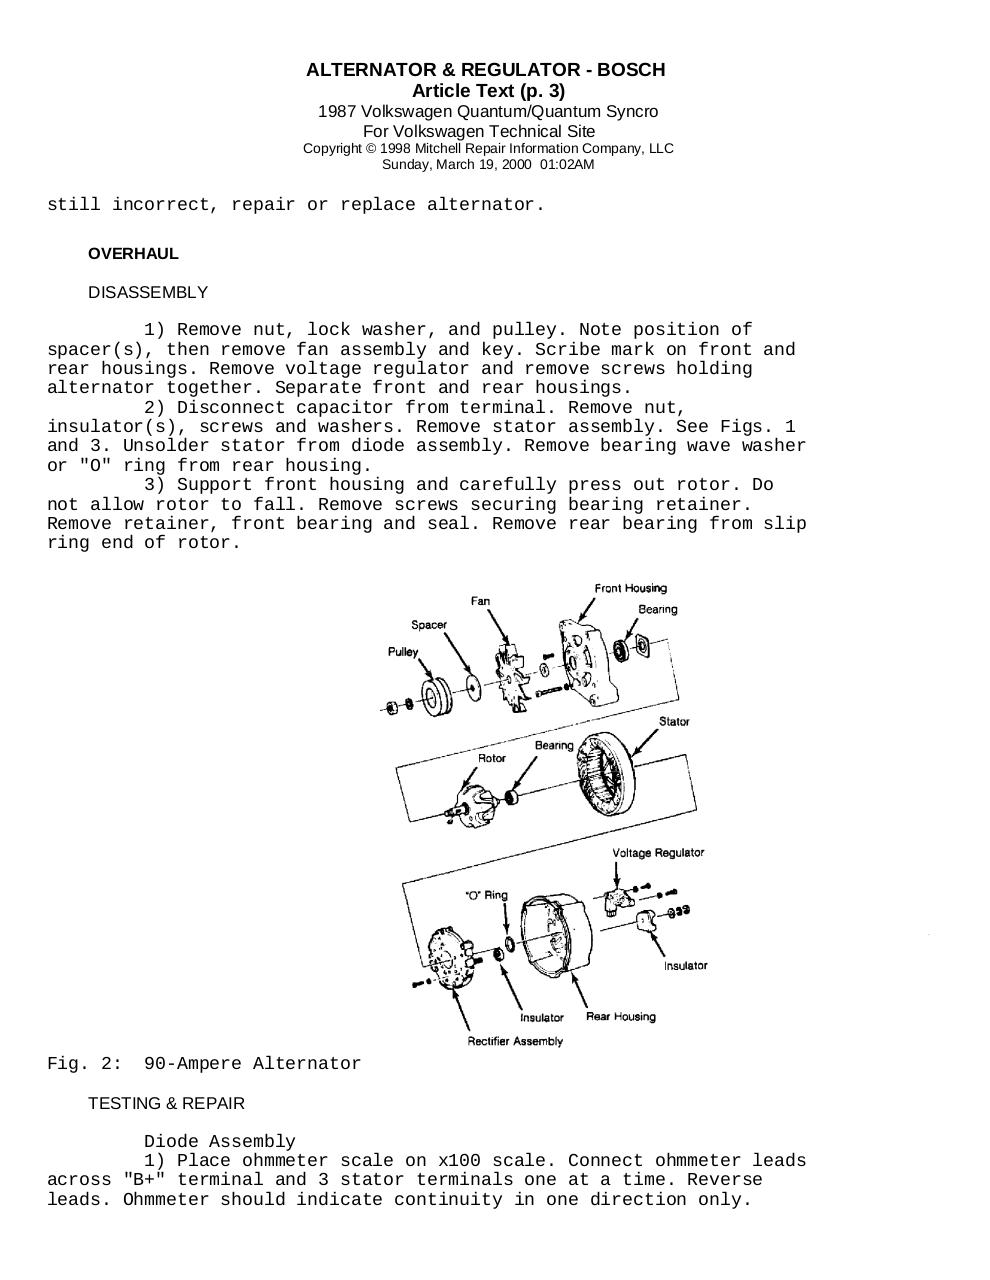 Alternator & Regulator Bosch - Fichier PDF